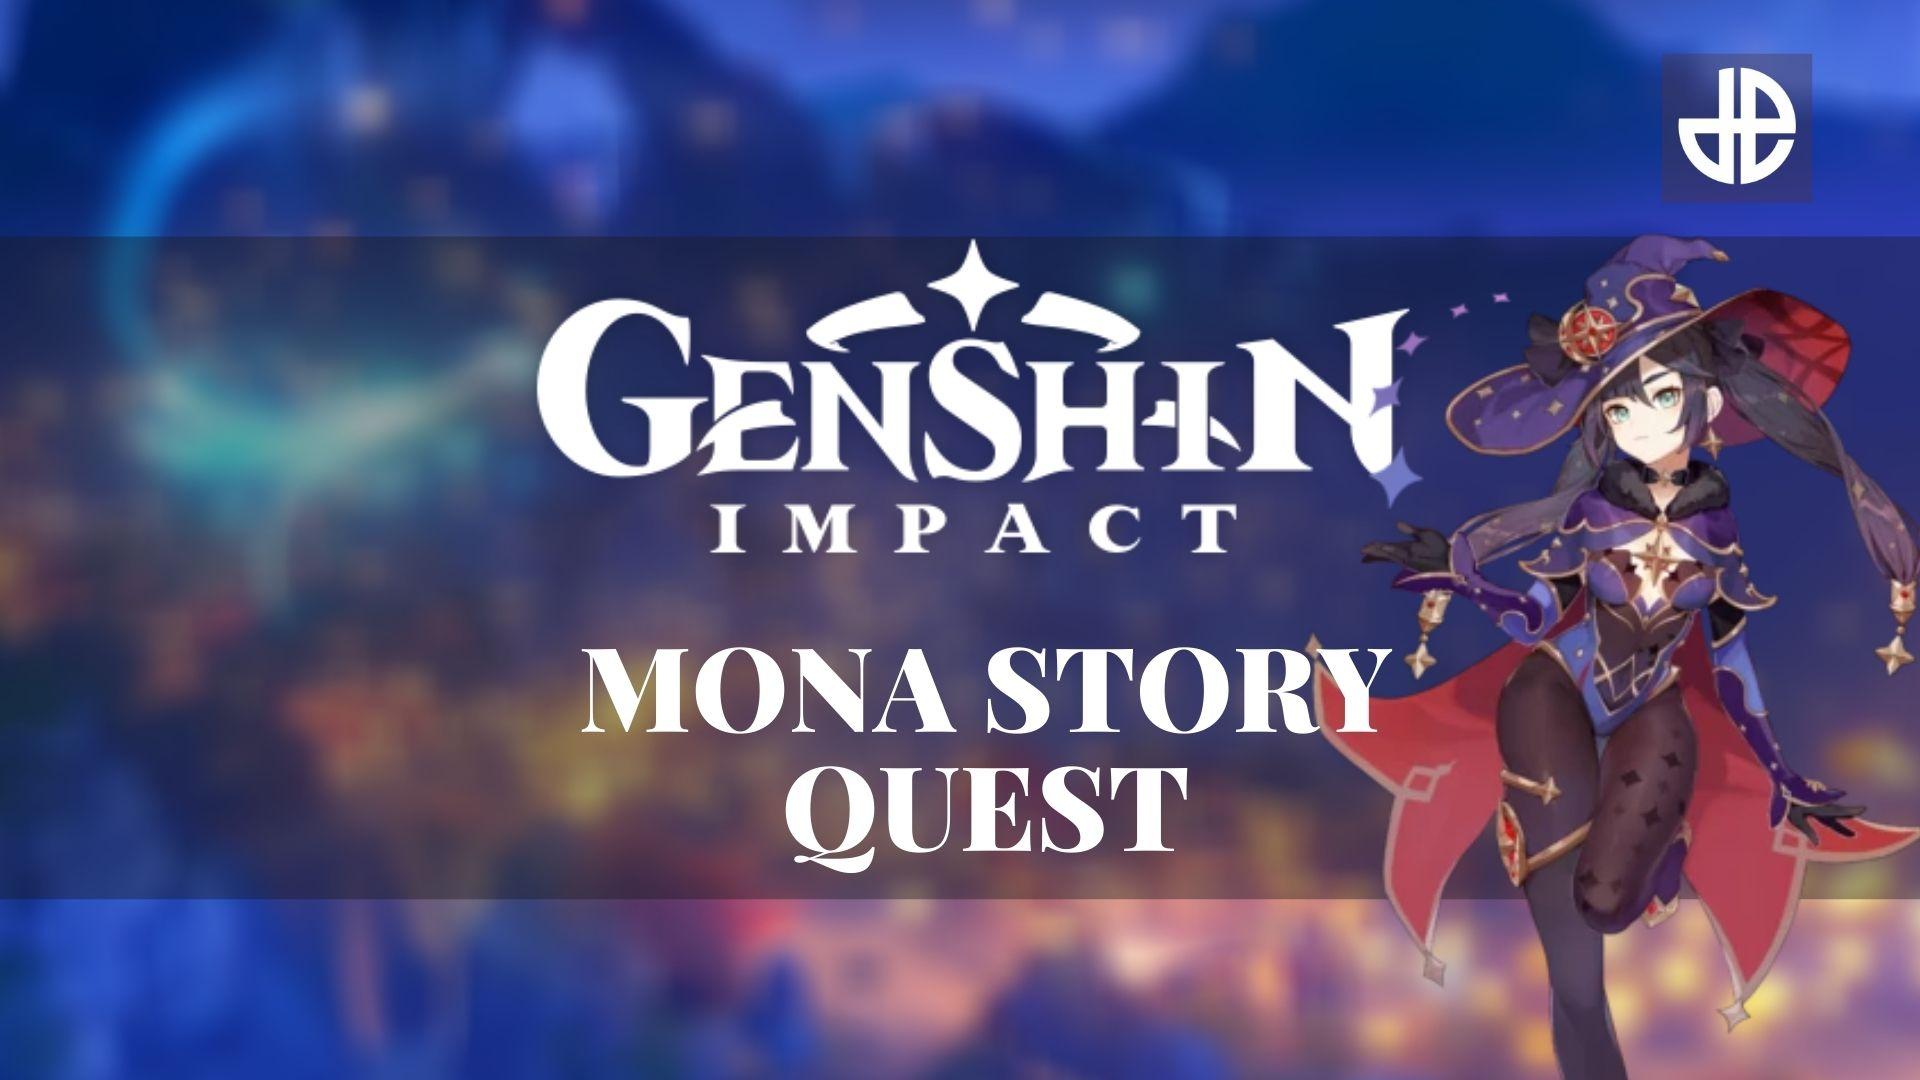 Mona Story Quest Genshin Impact